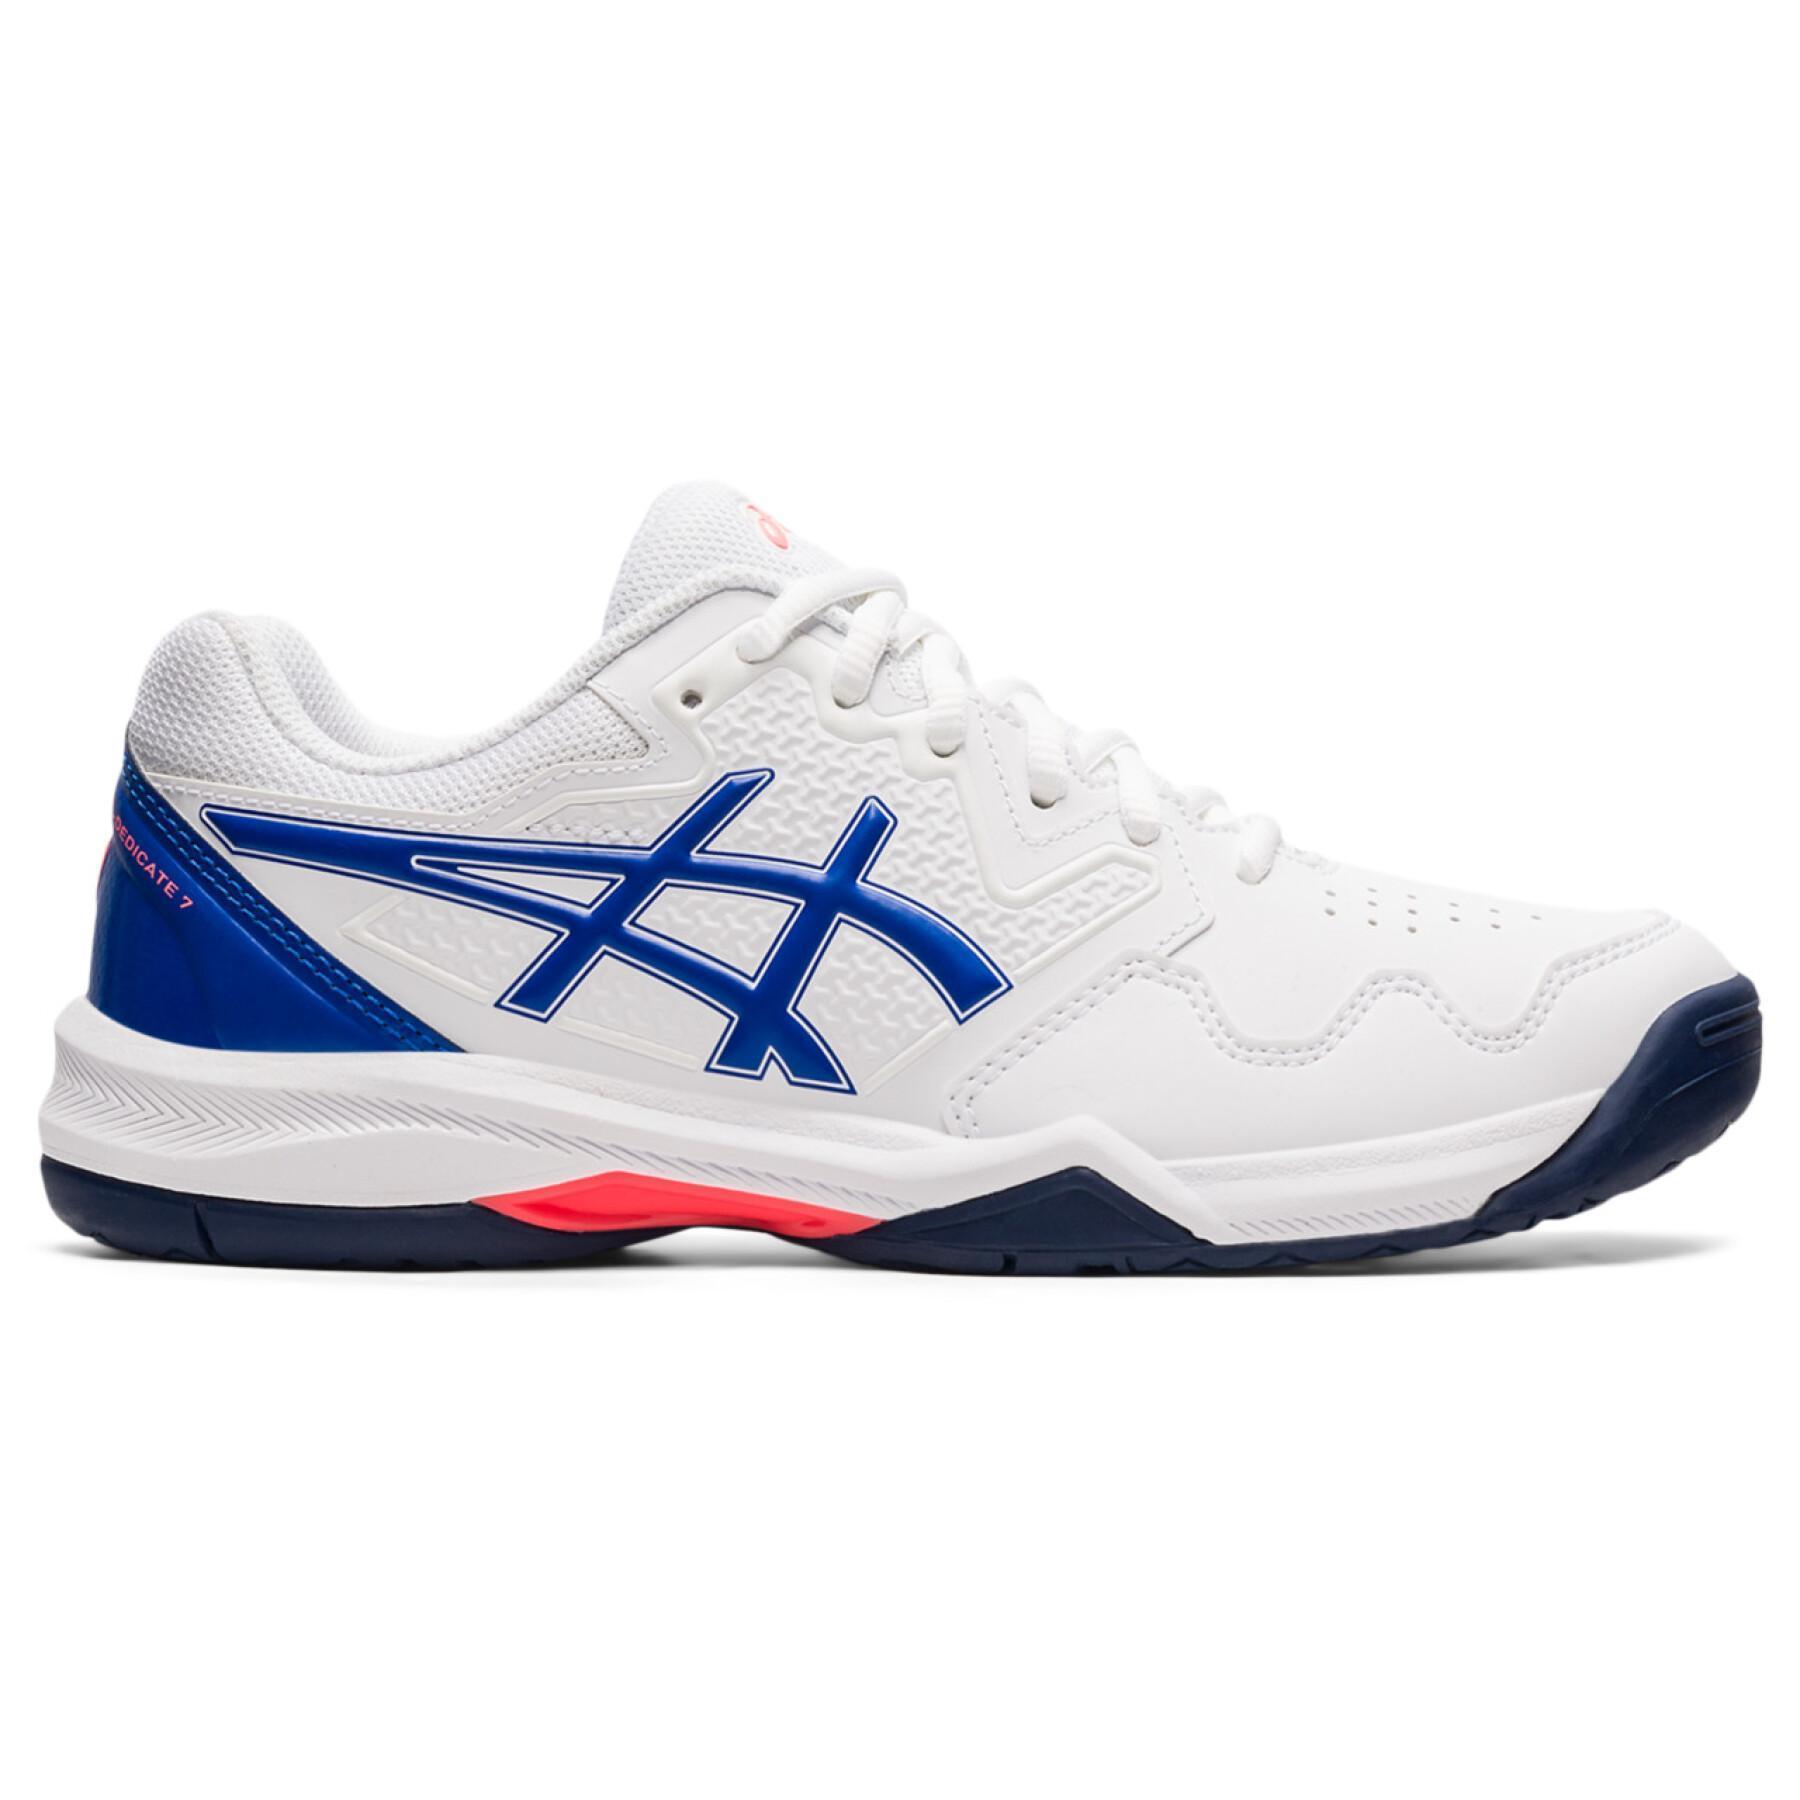 Women's shoes Asics Gel-Dedicate 7